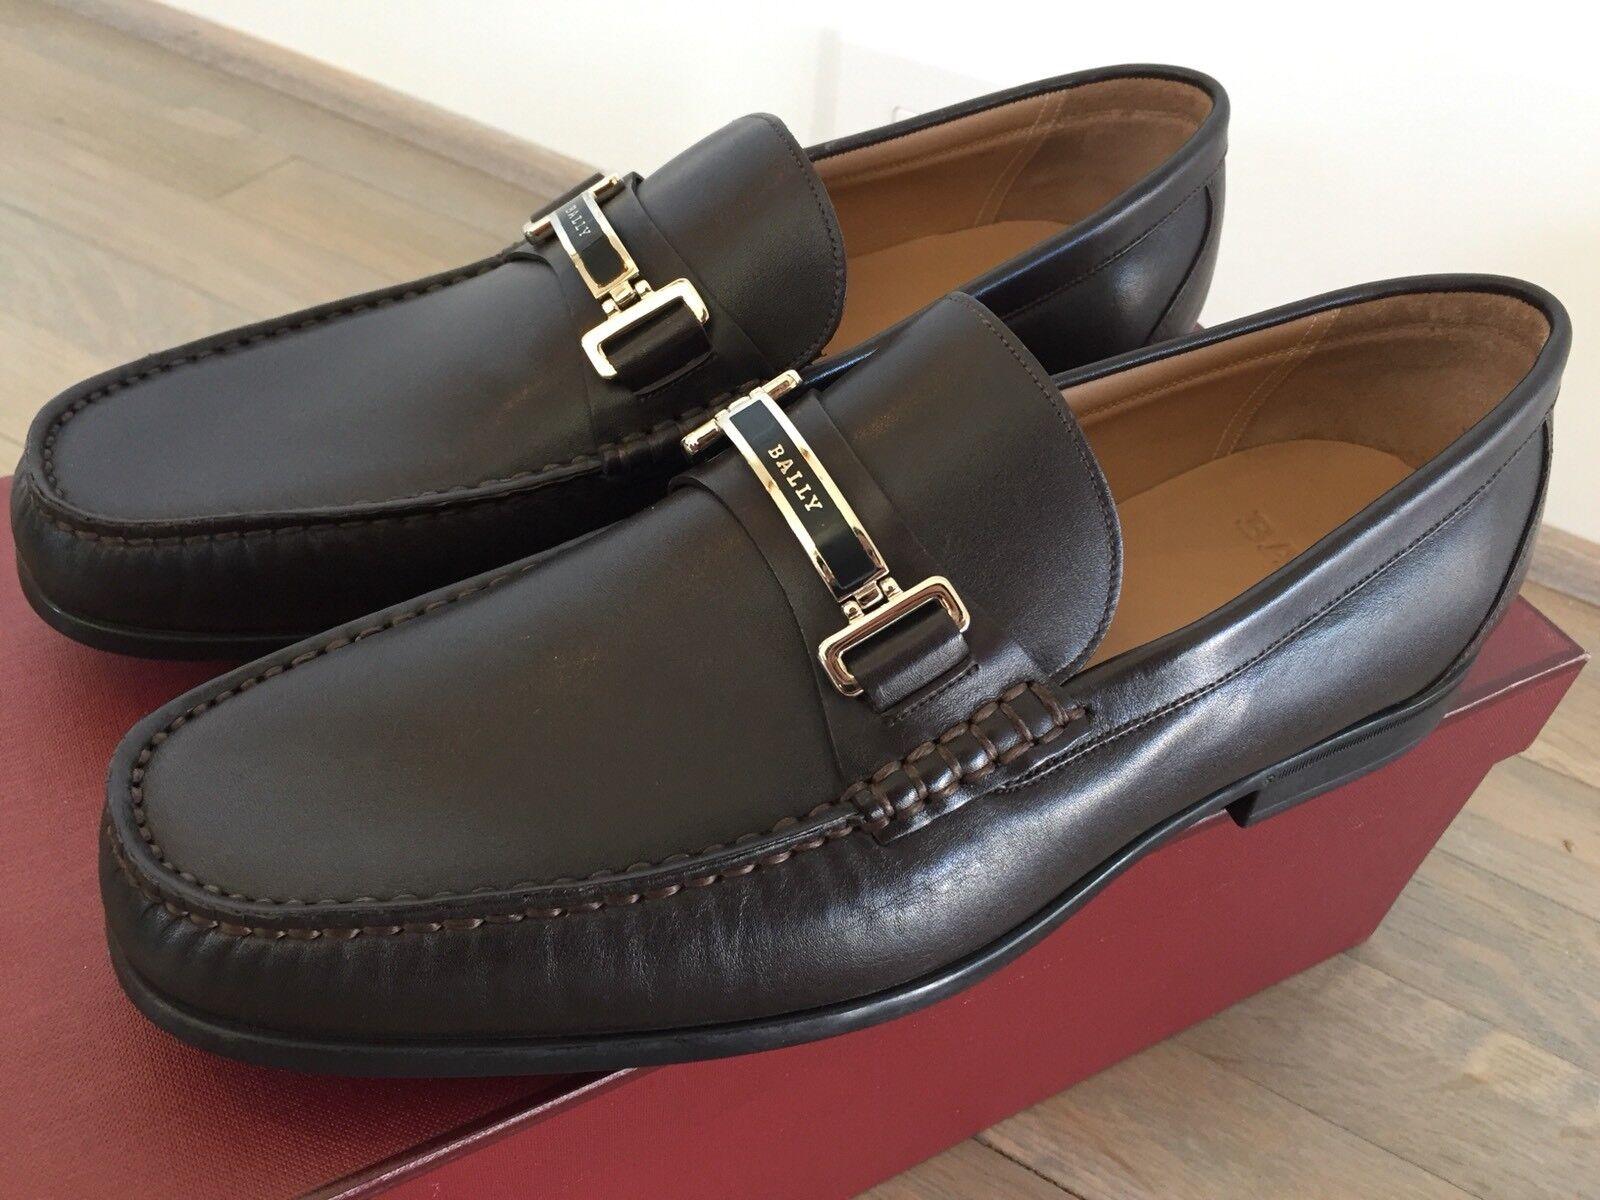 650  Bally braun Terenz Leather Loafers Größe US 10.5 Made in Switzerland